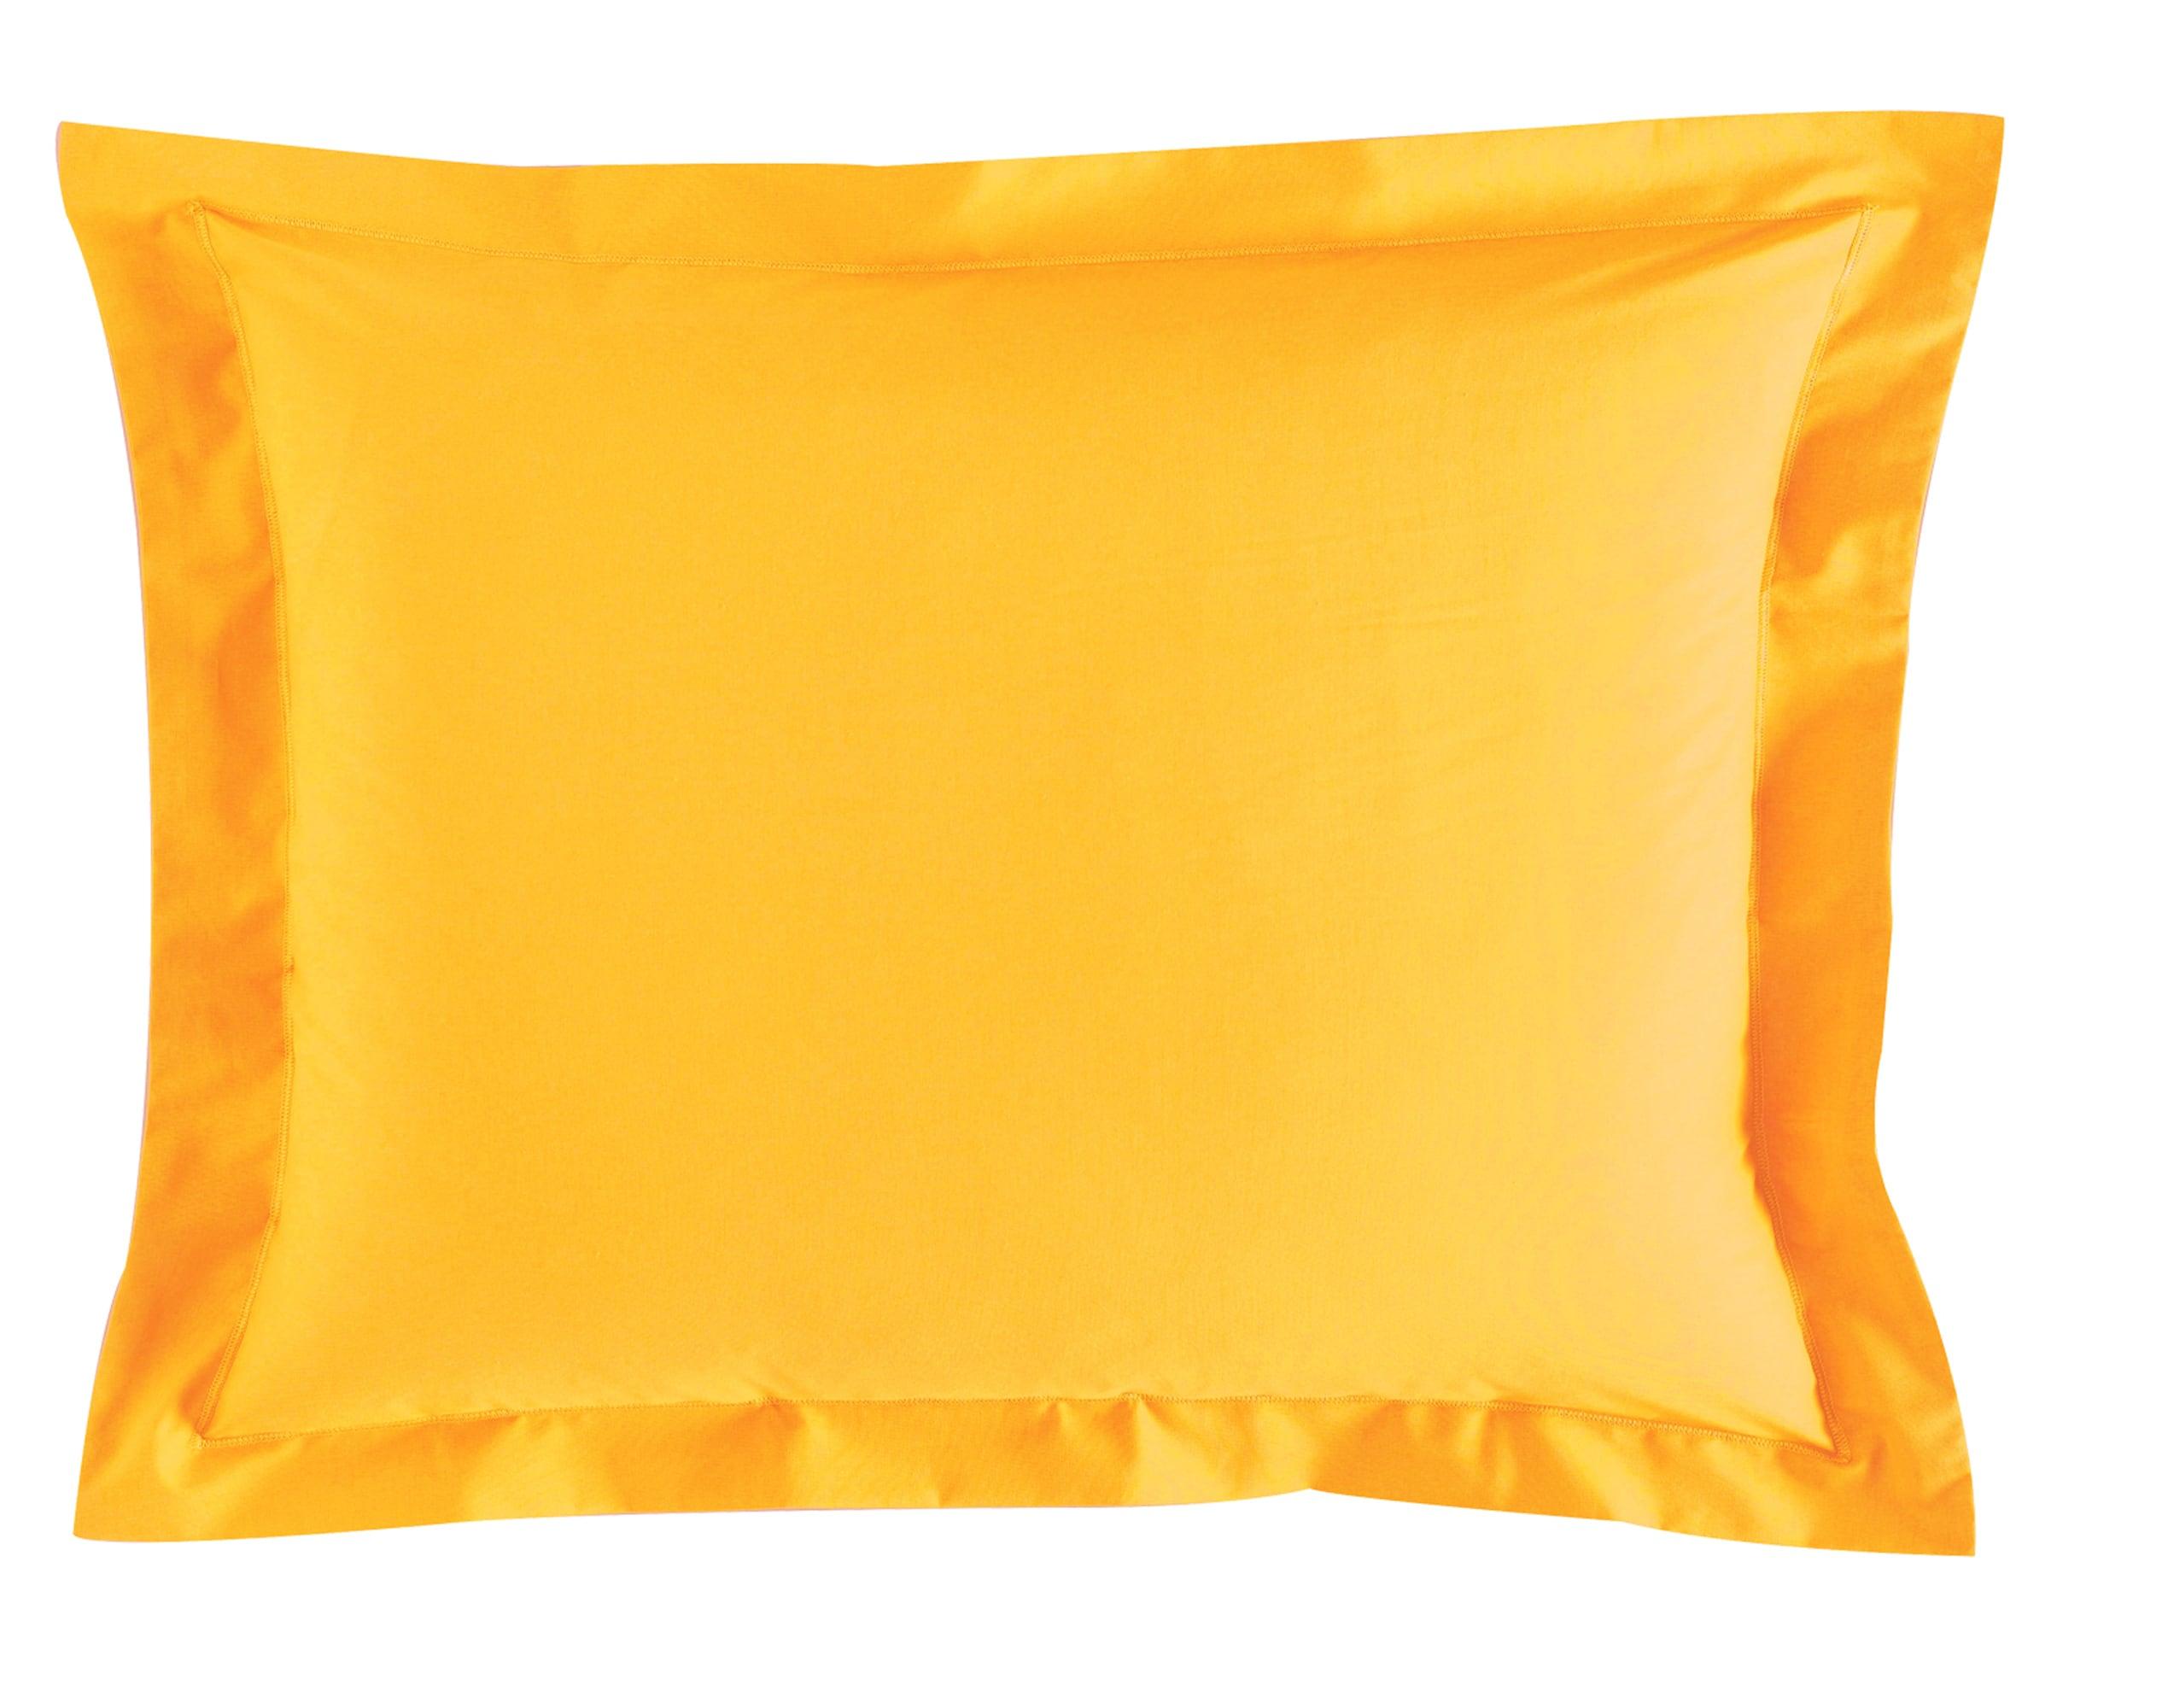 Taie d'oreiller 50x70 en percale de coton  jaune ocre